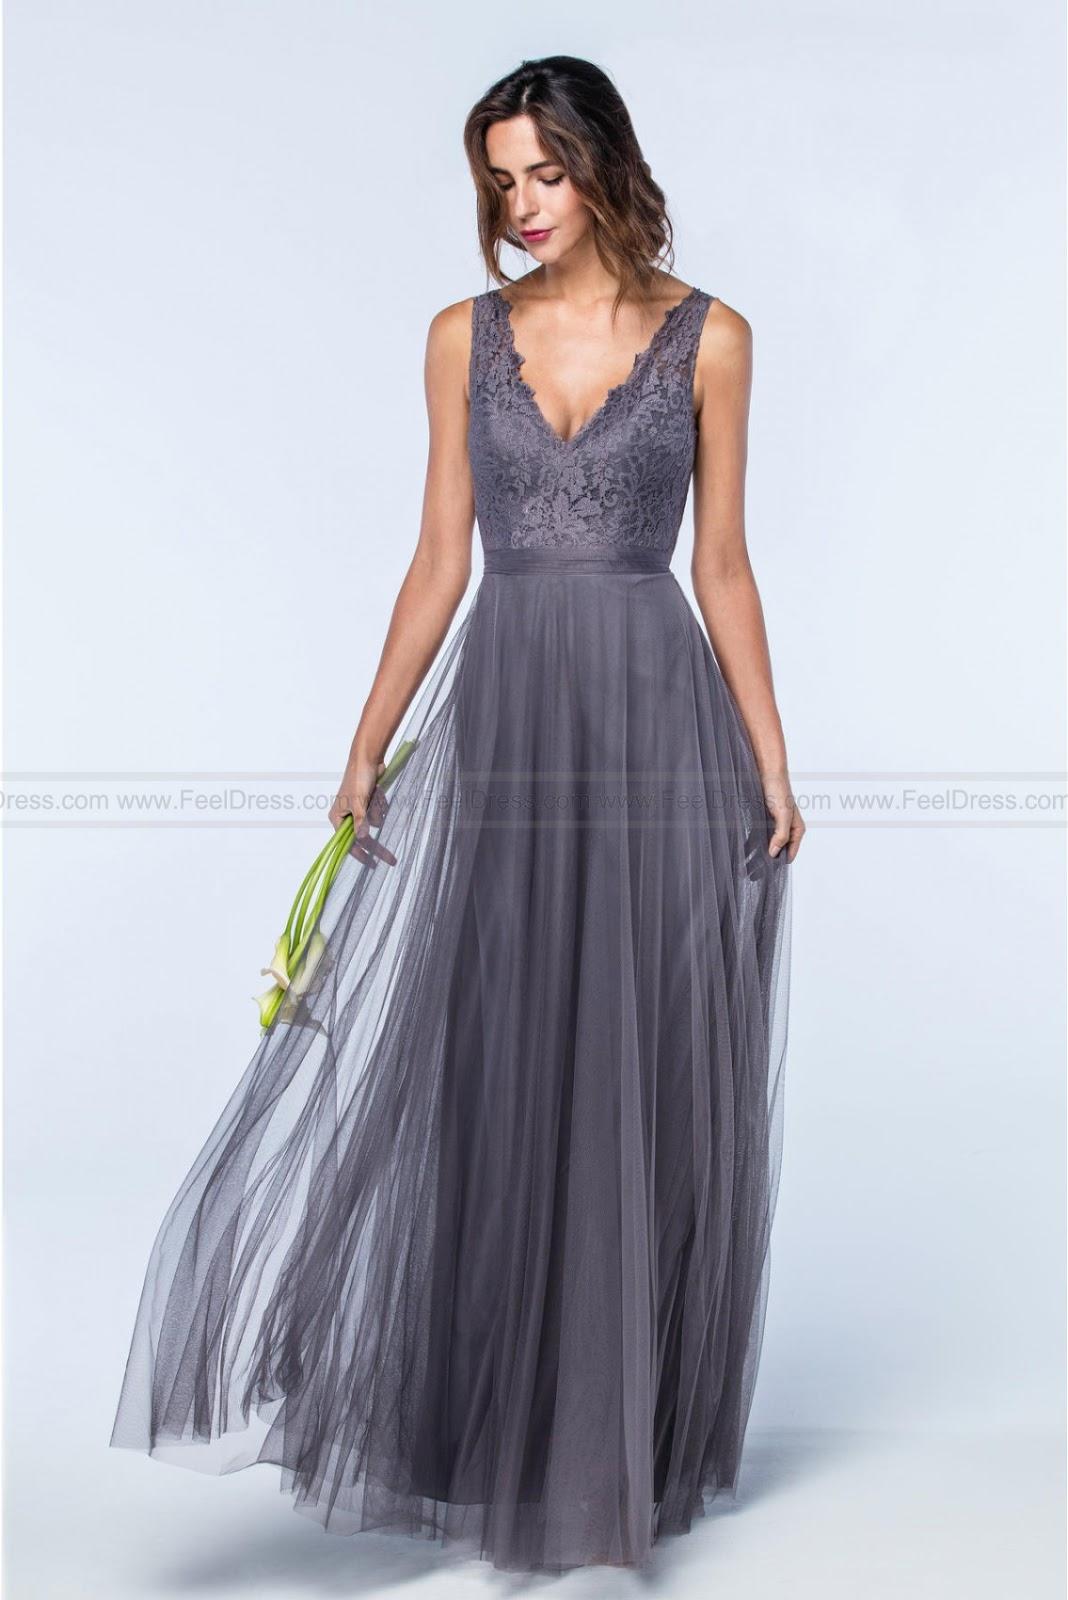 32bf7136e196 2016 cheap wedding dresses: Watters Desiree Bridesmaid Dress Style 2600